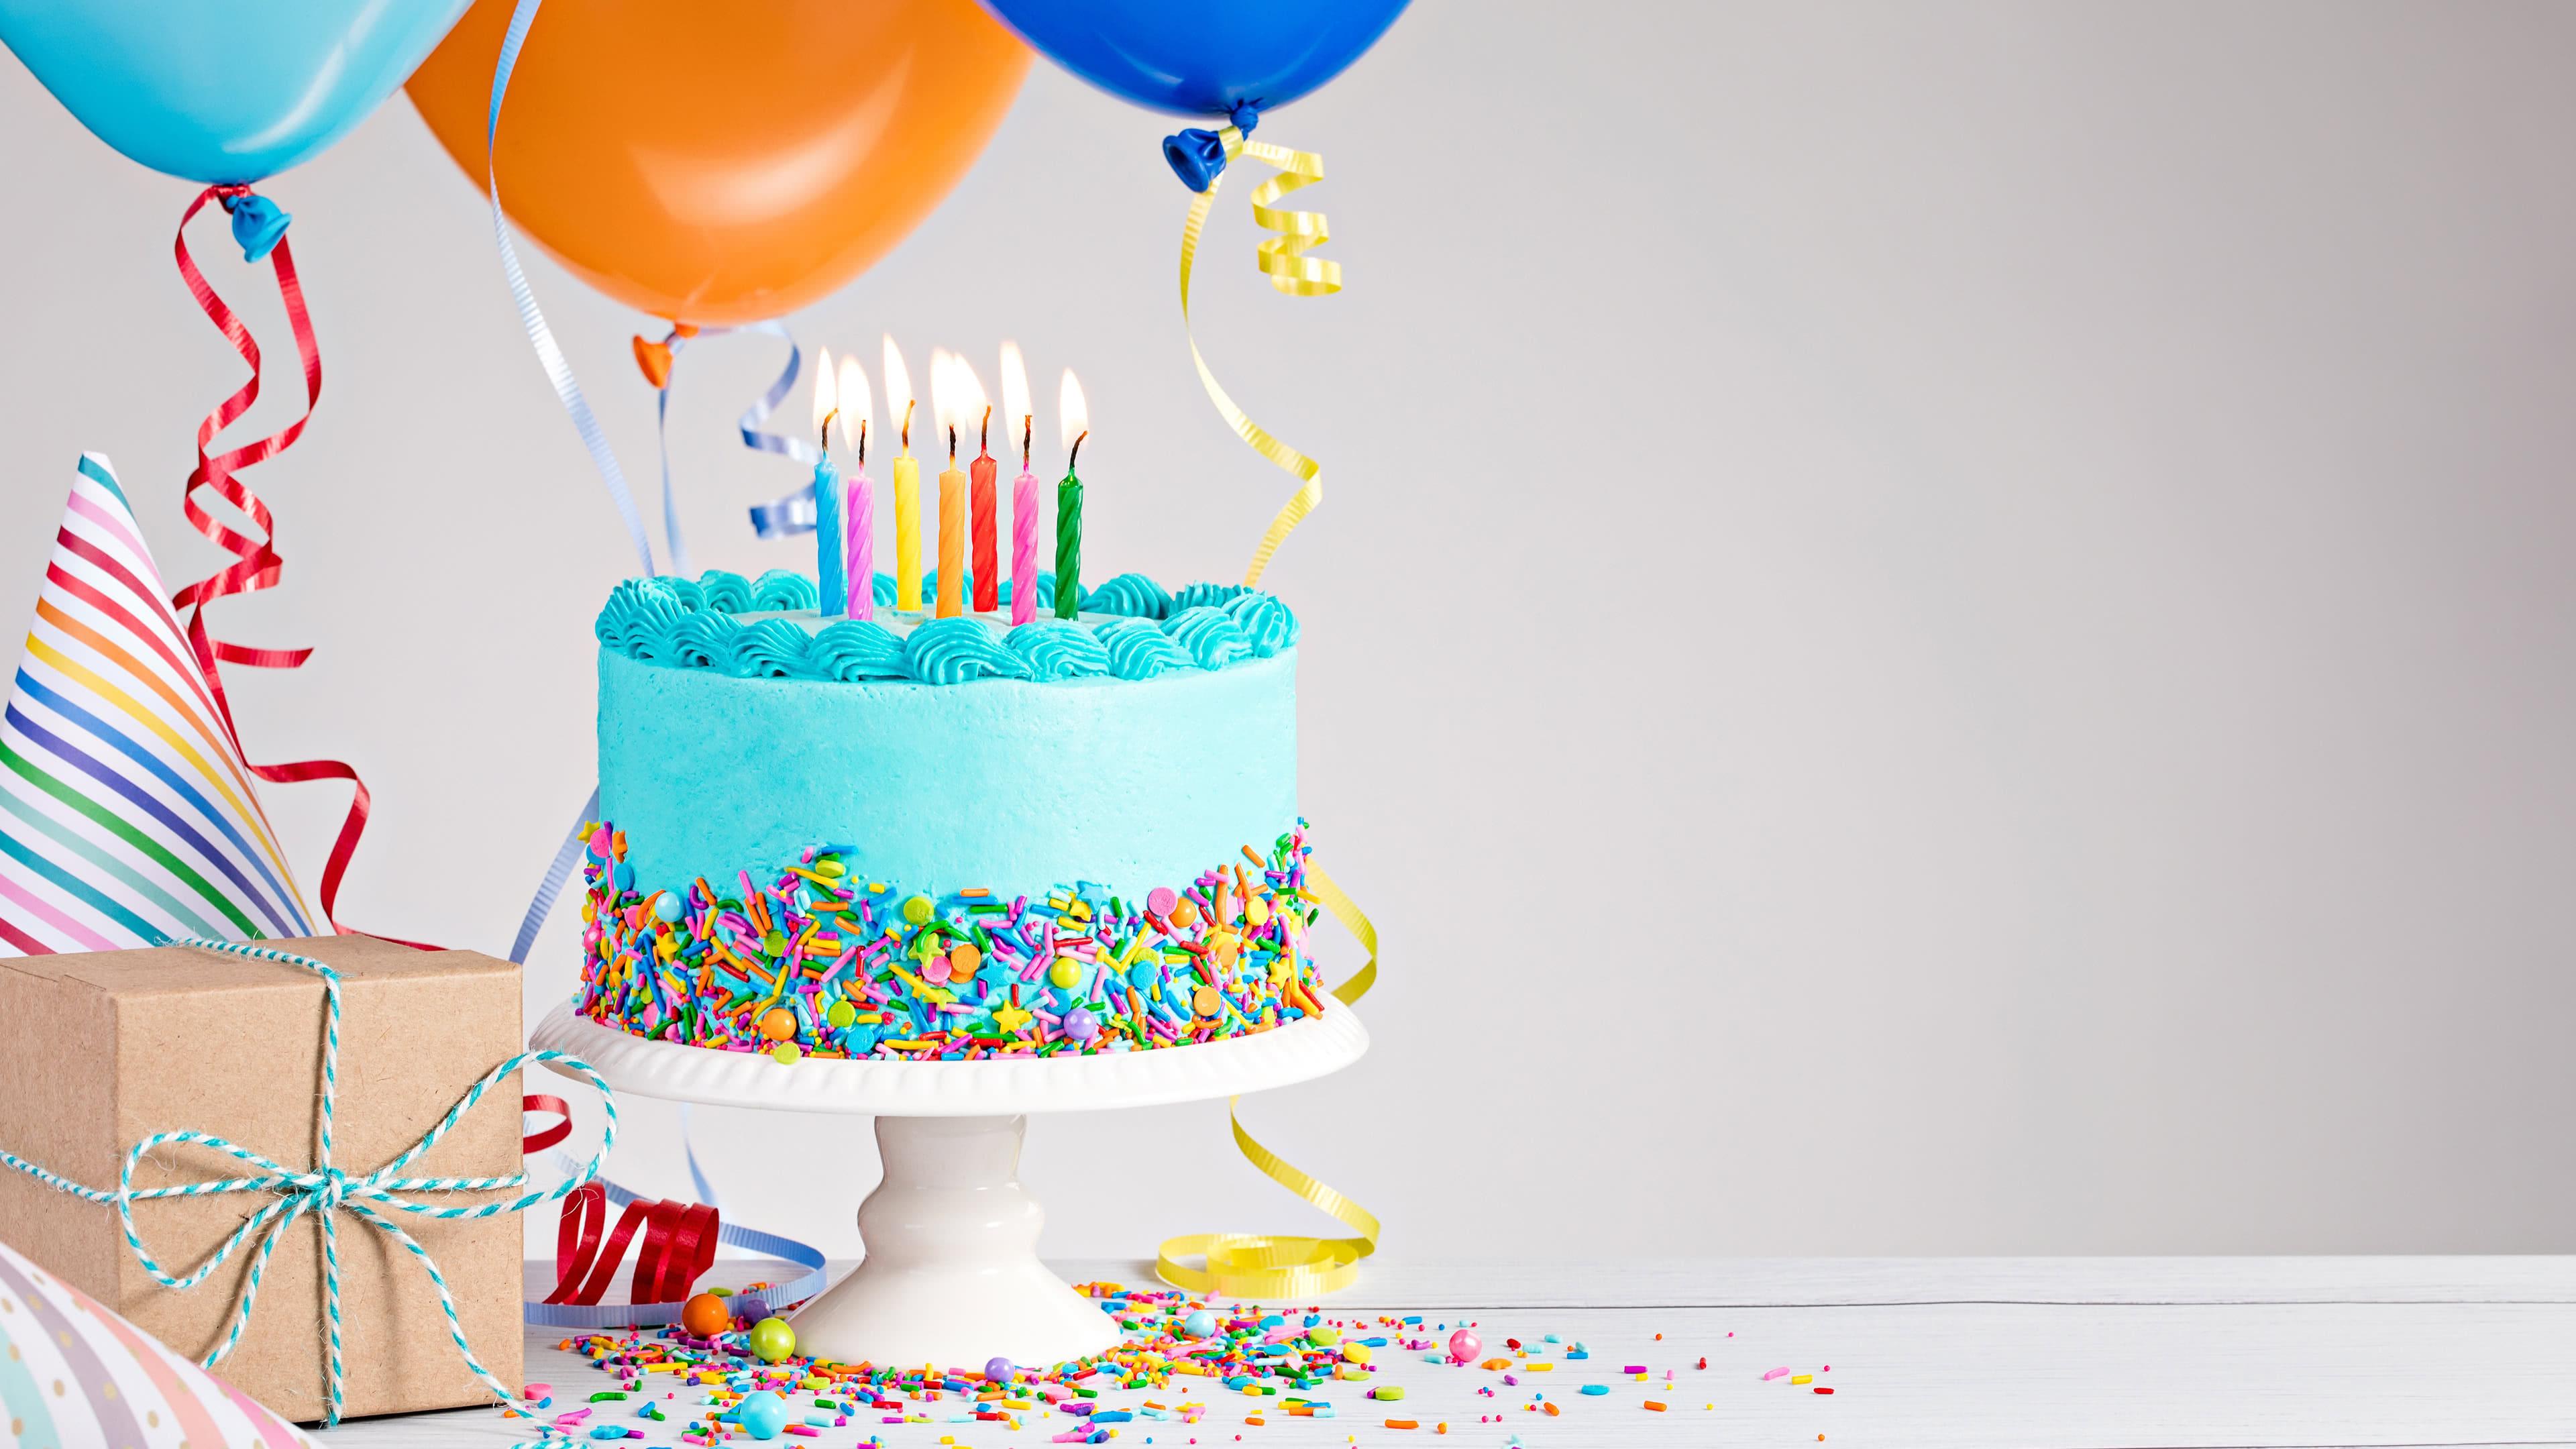 Birthday Cake And Balloons Uhd 4k Wallpaper Pixelz Cc